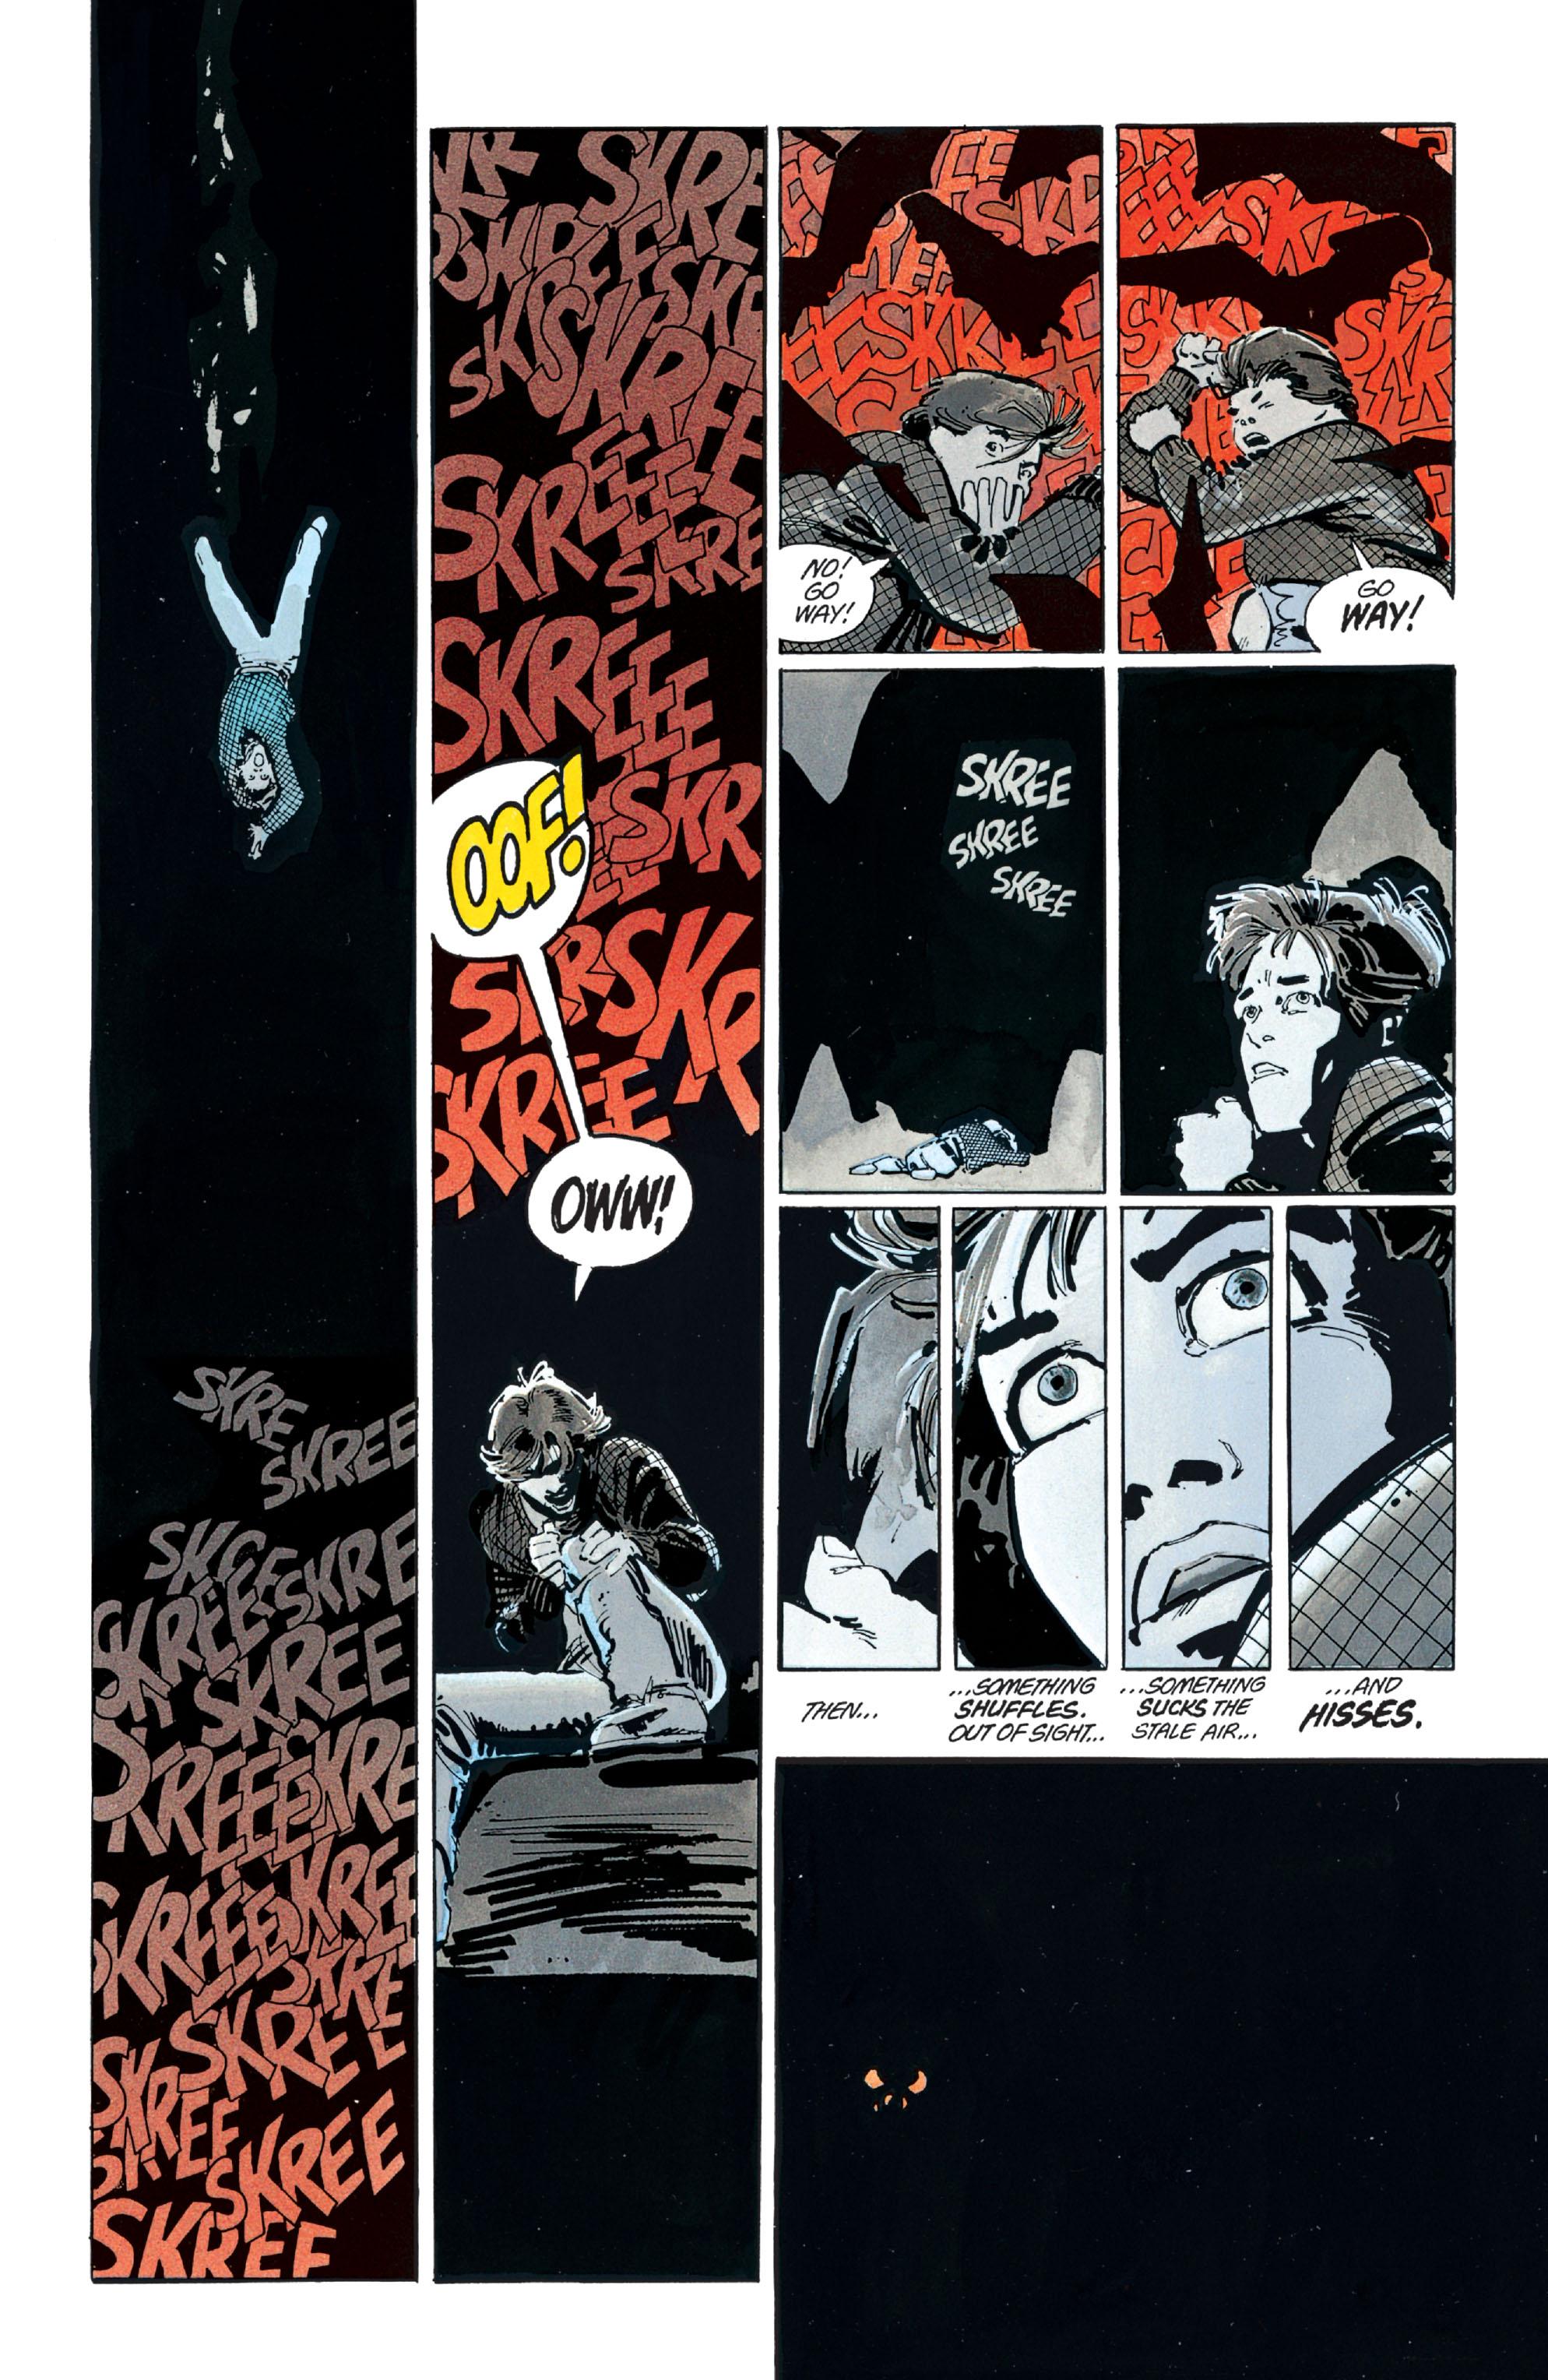 Psychology of Bruce Wayne 45X-F6vAW0CPagAUzZo9O3G9K5VQWHythZ_cunNsCJIulU9wE8vVg66sMSW_uAULPCfTLrwFpTEB=s0